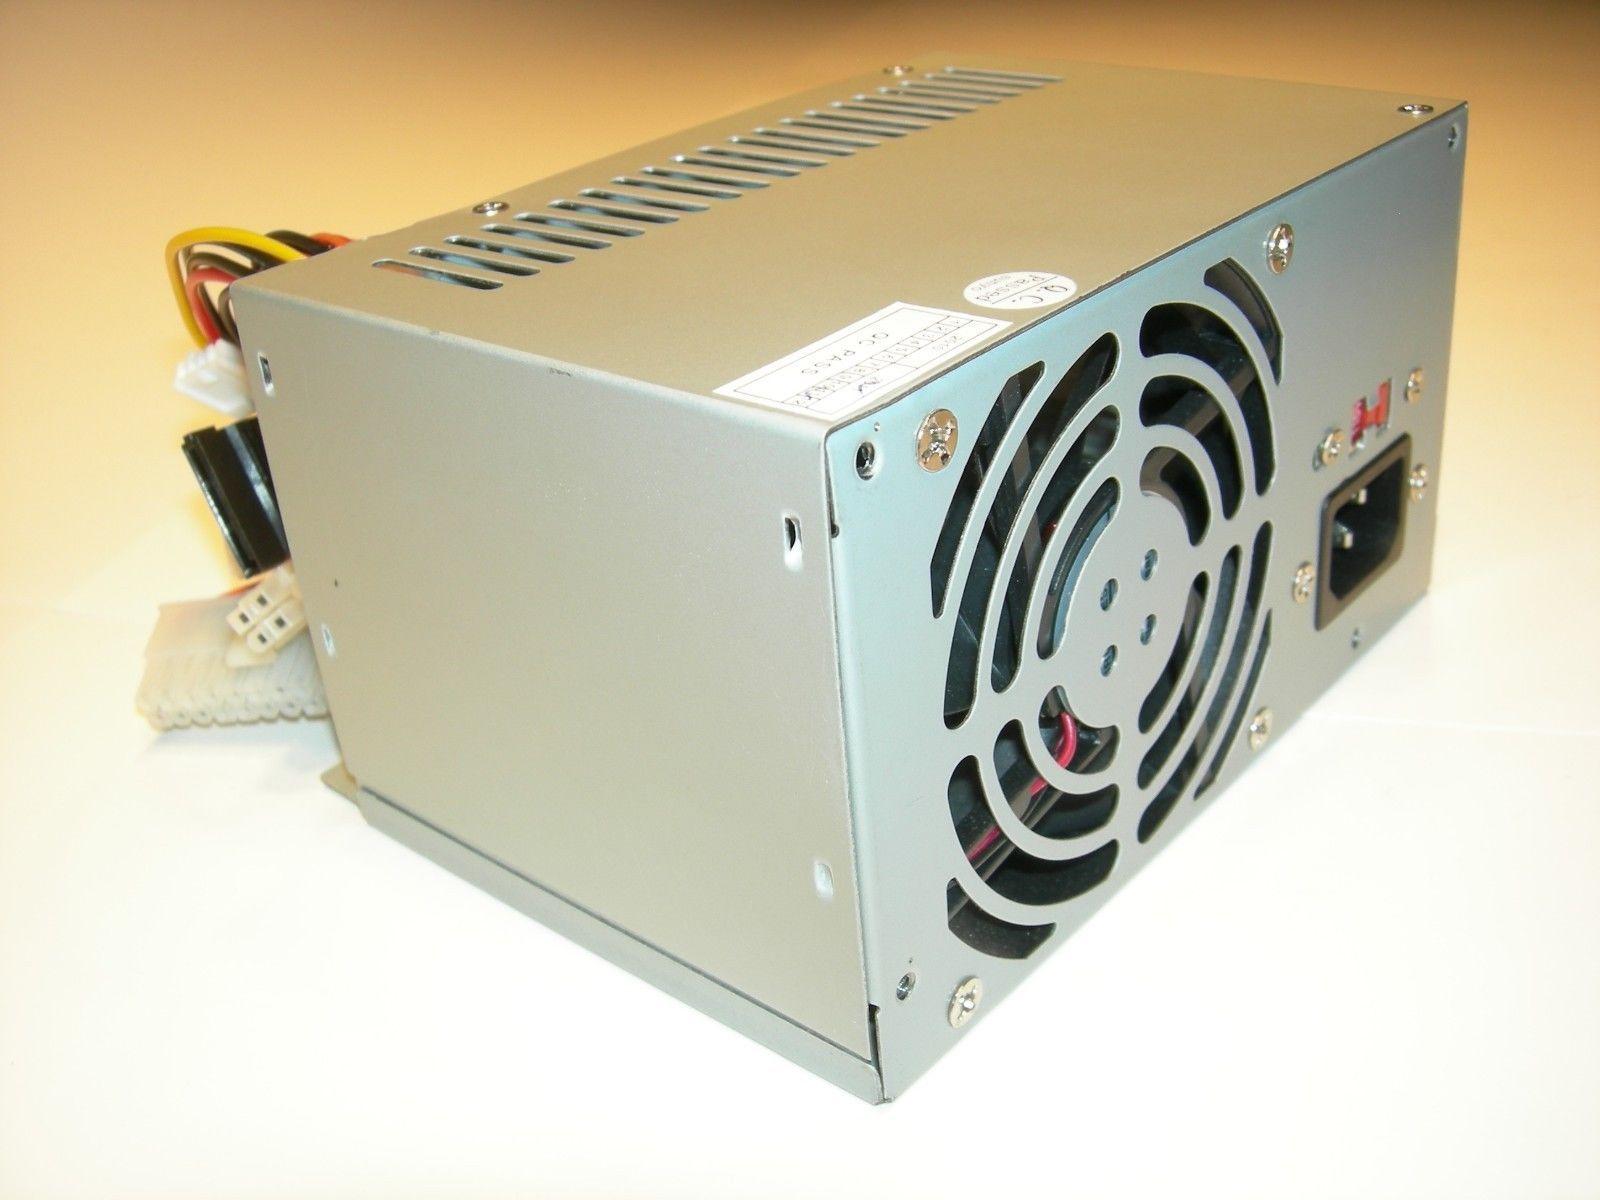 New PC Power Supply Upgrade for PowerMan FSP235-60GTW Desktop Computer